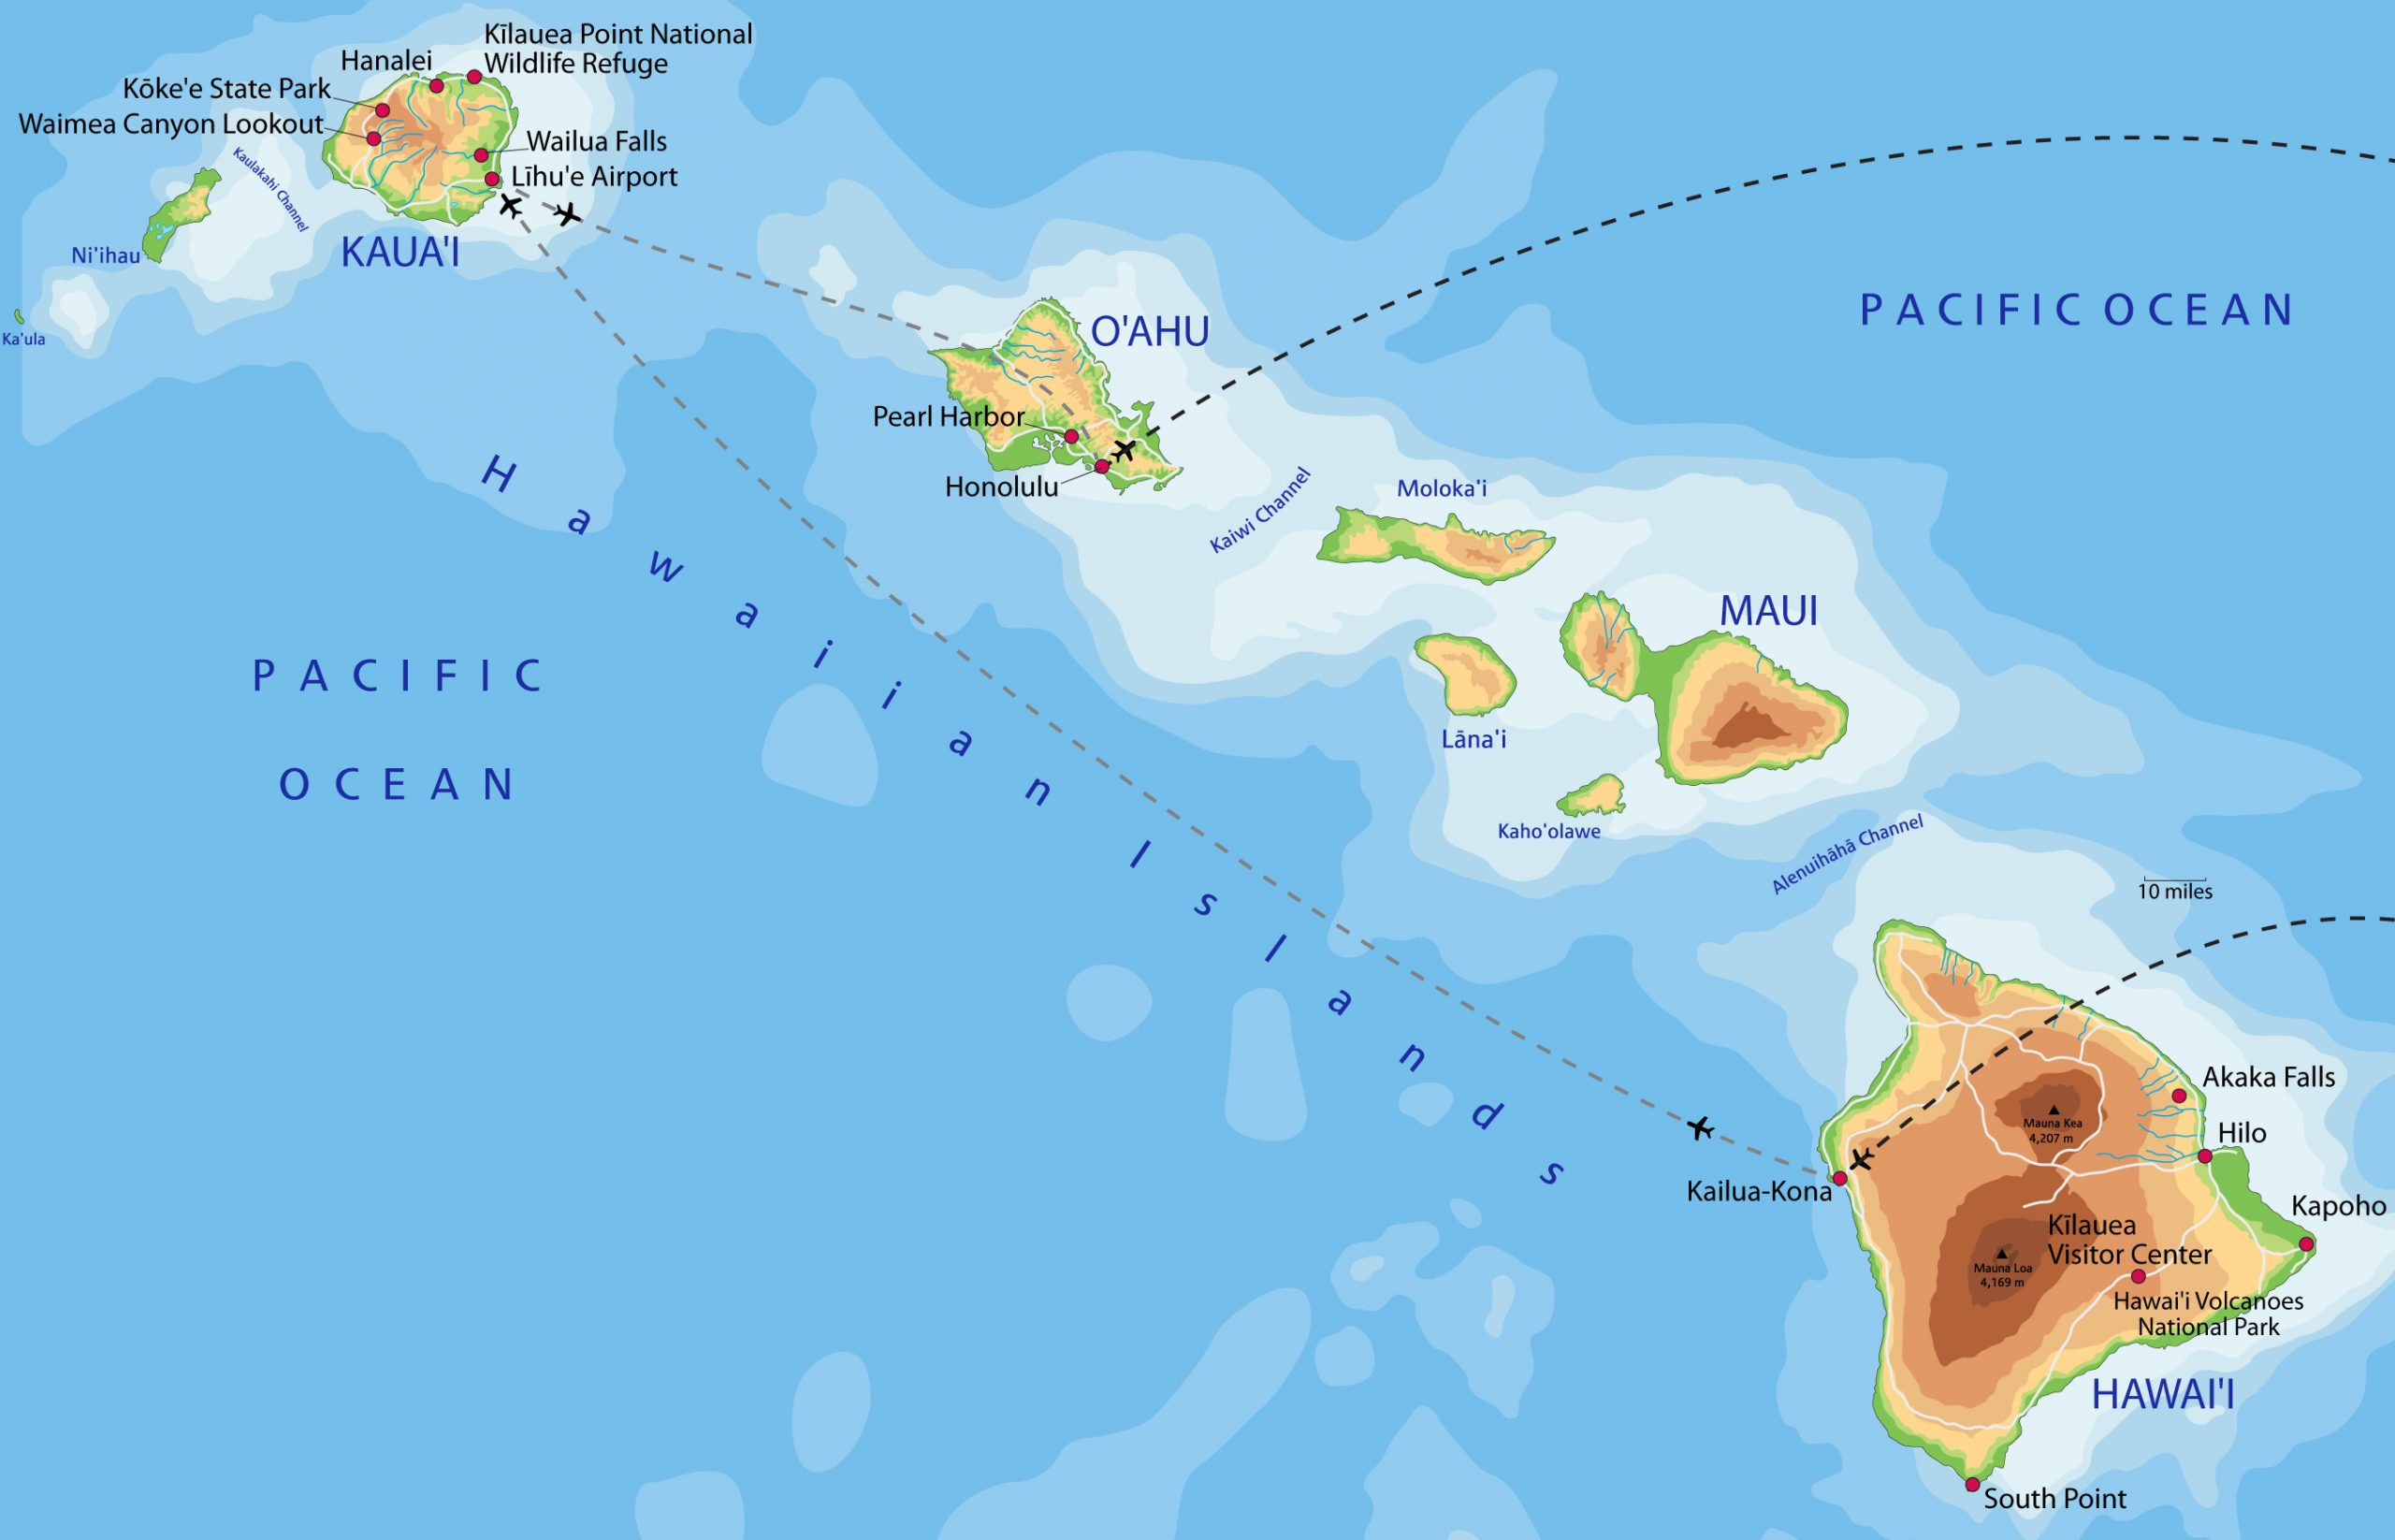 Hawaii</div>